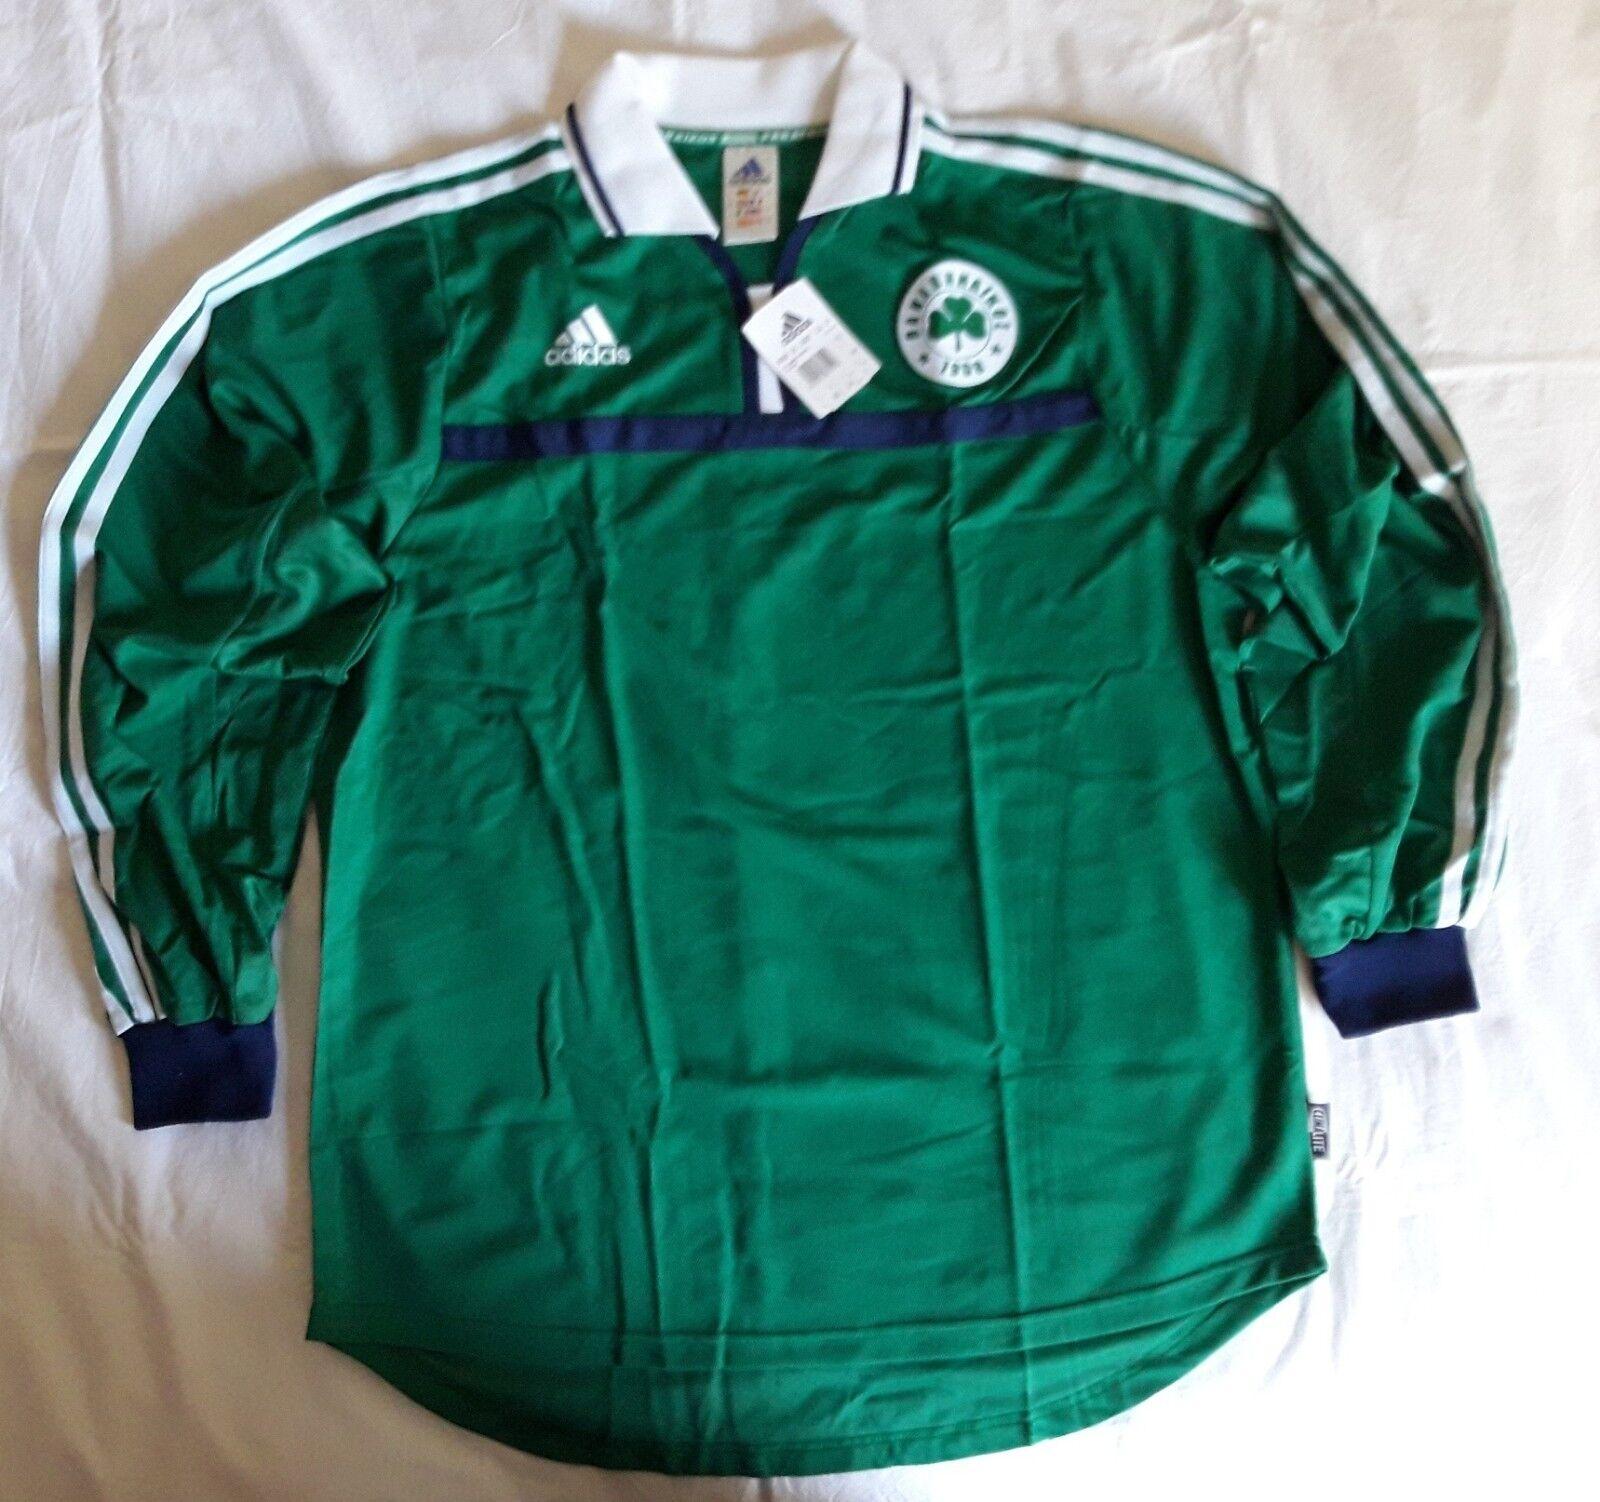 Panathinaikos 2001 2002 home footbtutti shirt soccer jersey, Adidas, Dimensione L, BNWT